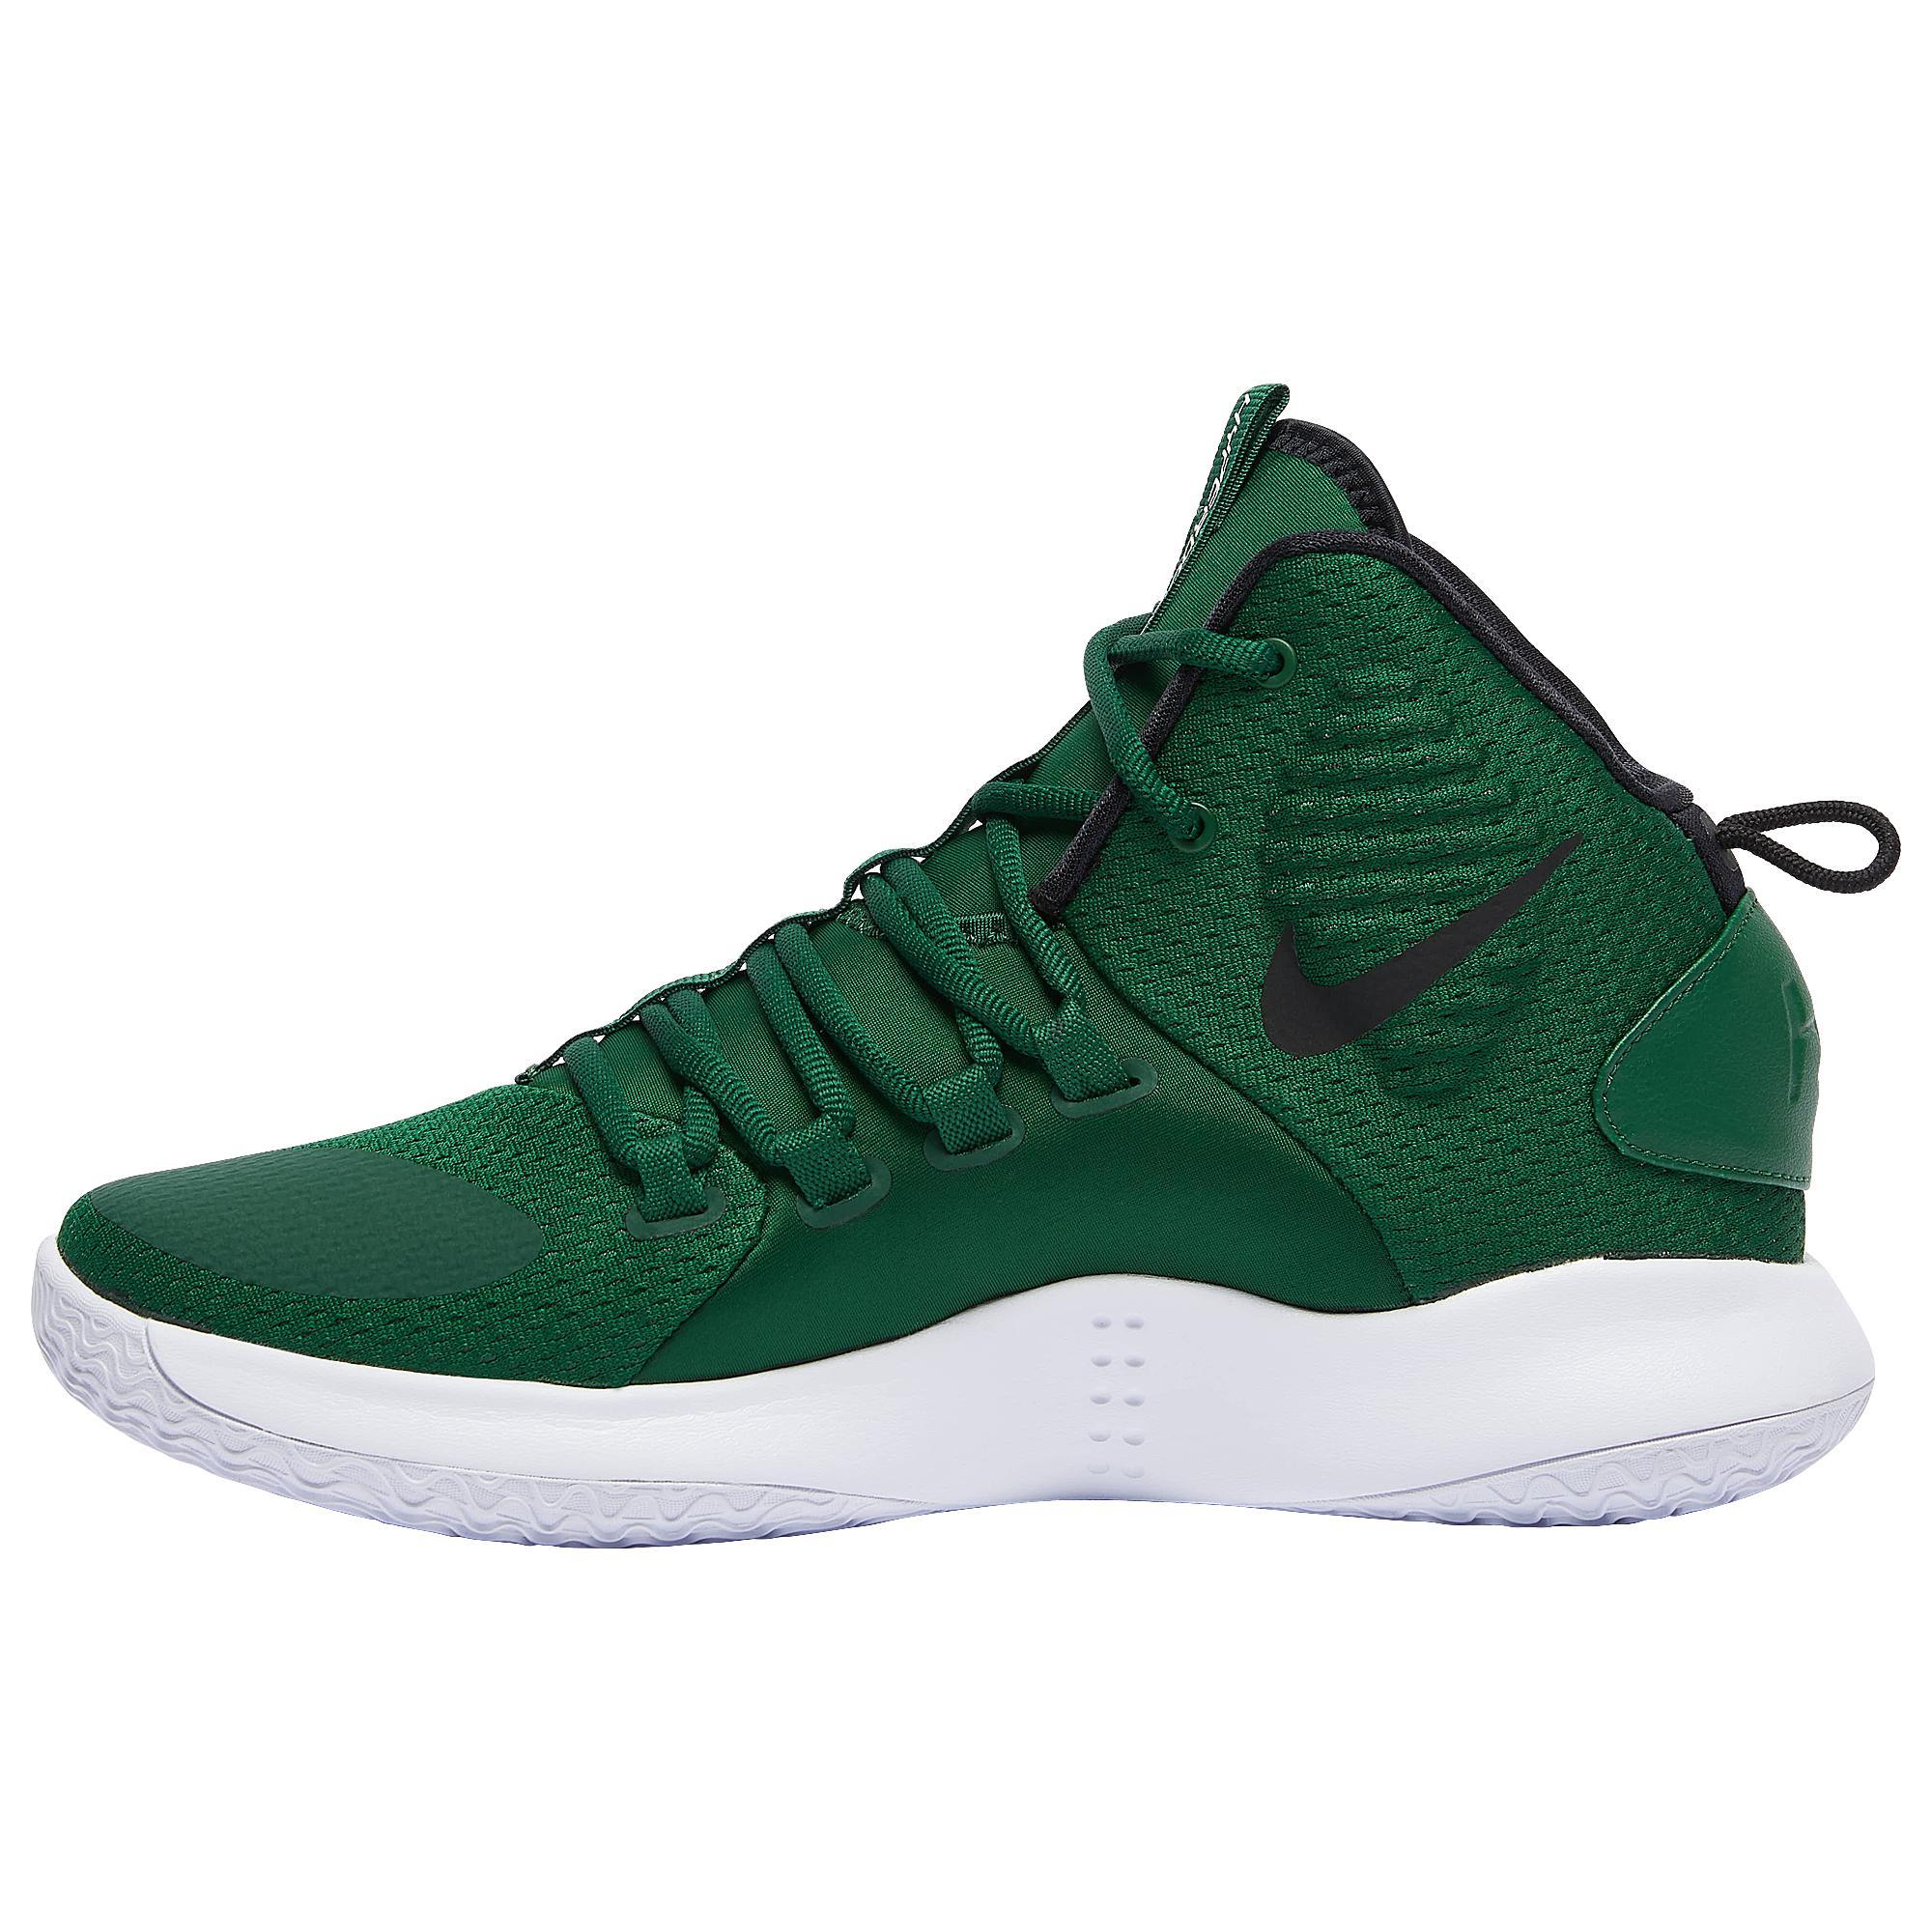 Nike Hyperdunk X Mid in Green/White